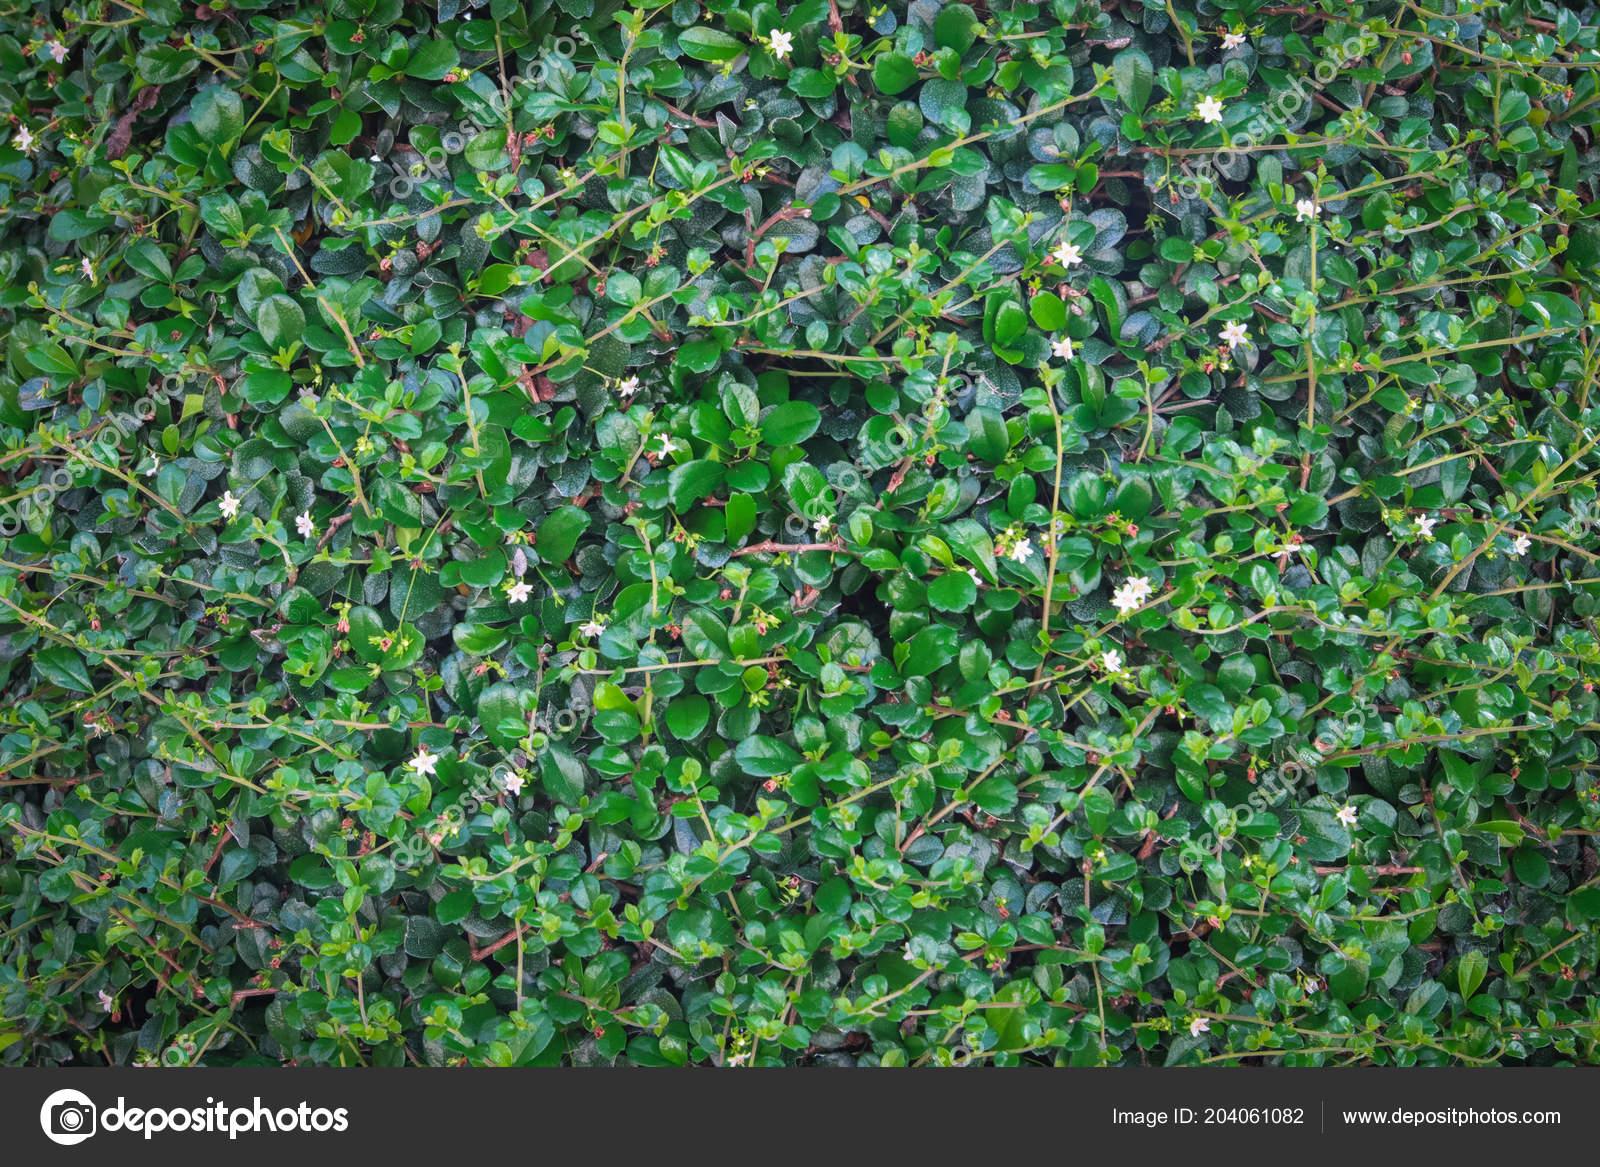 Green Ivy Bush Wall Garden \u2014 Stock Photo © nattapol 204061082